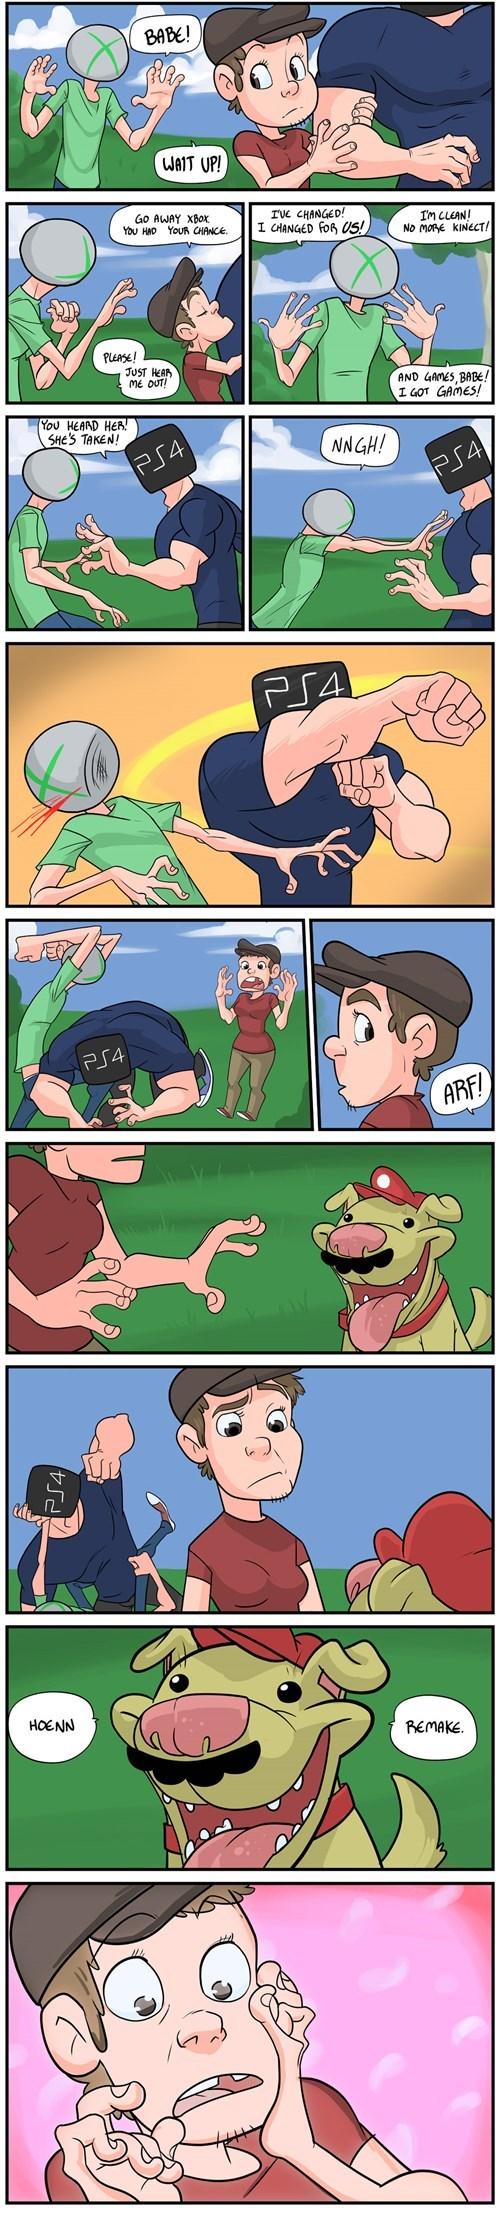 gaming gamers video games web comics hoenn remake - 8247894016